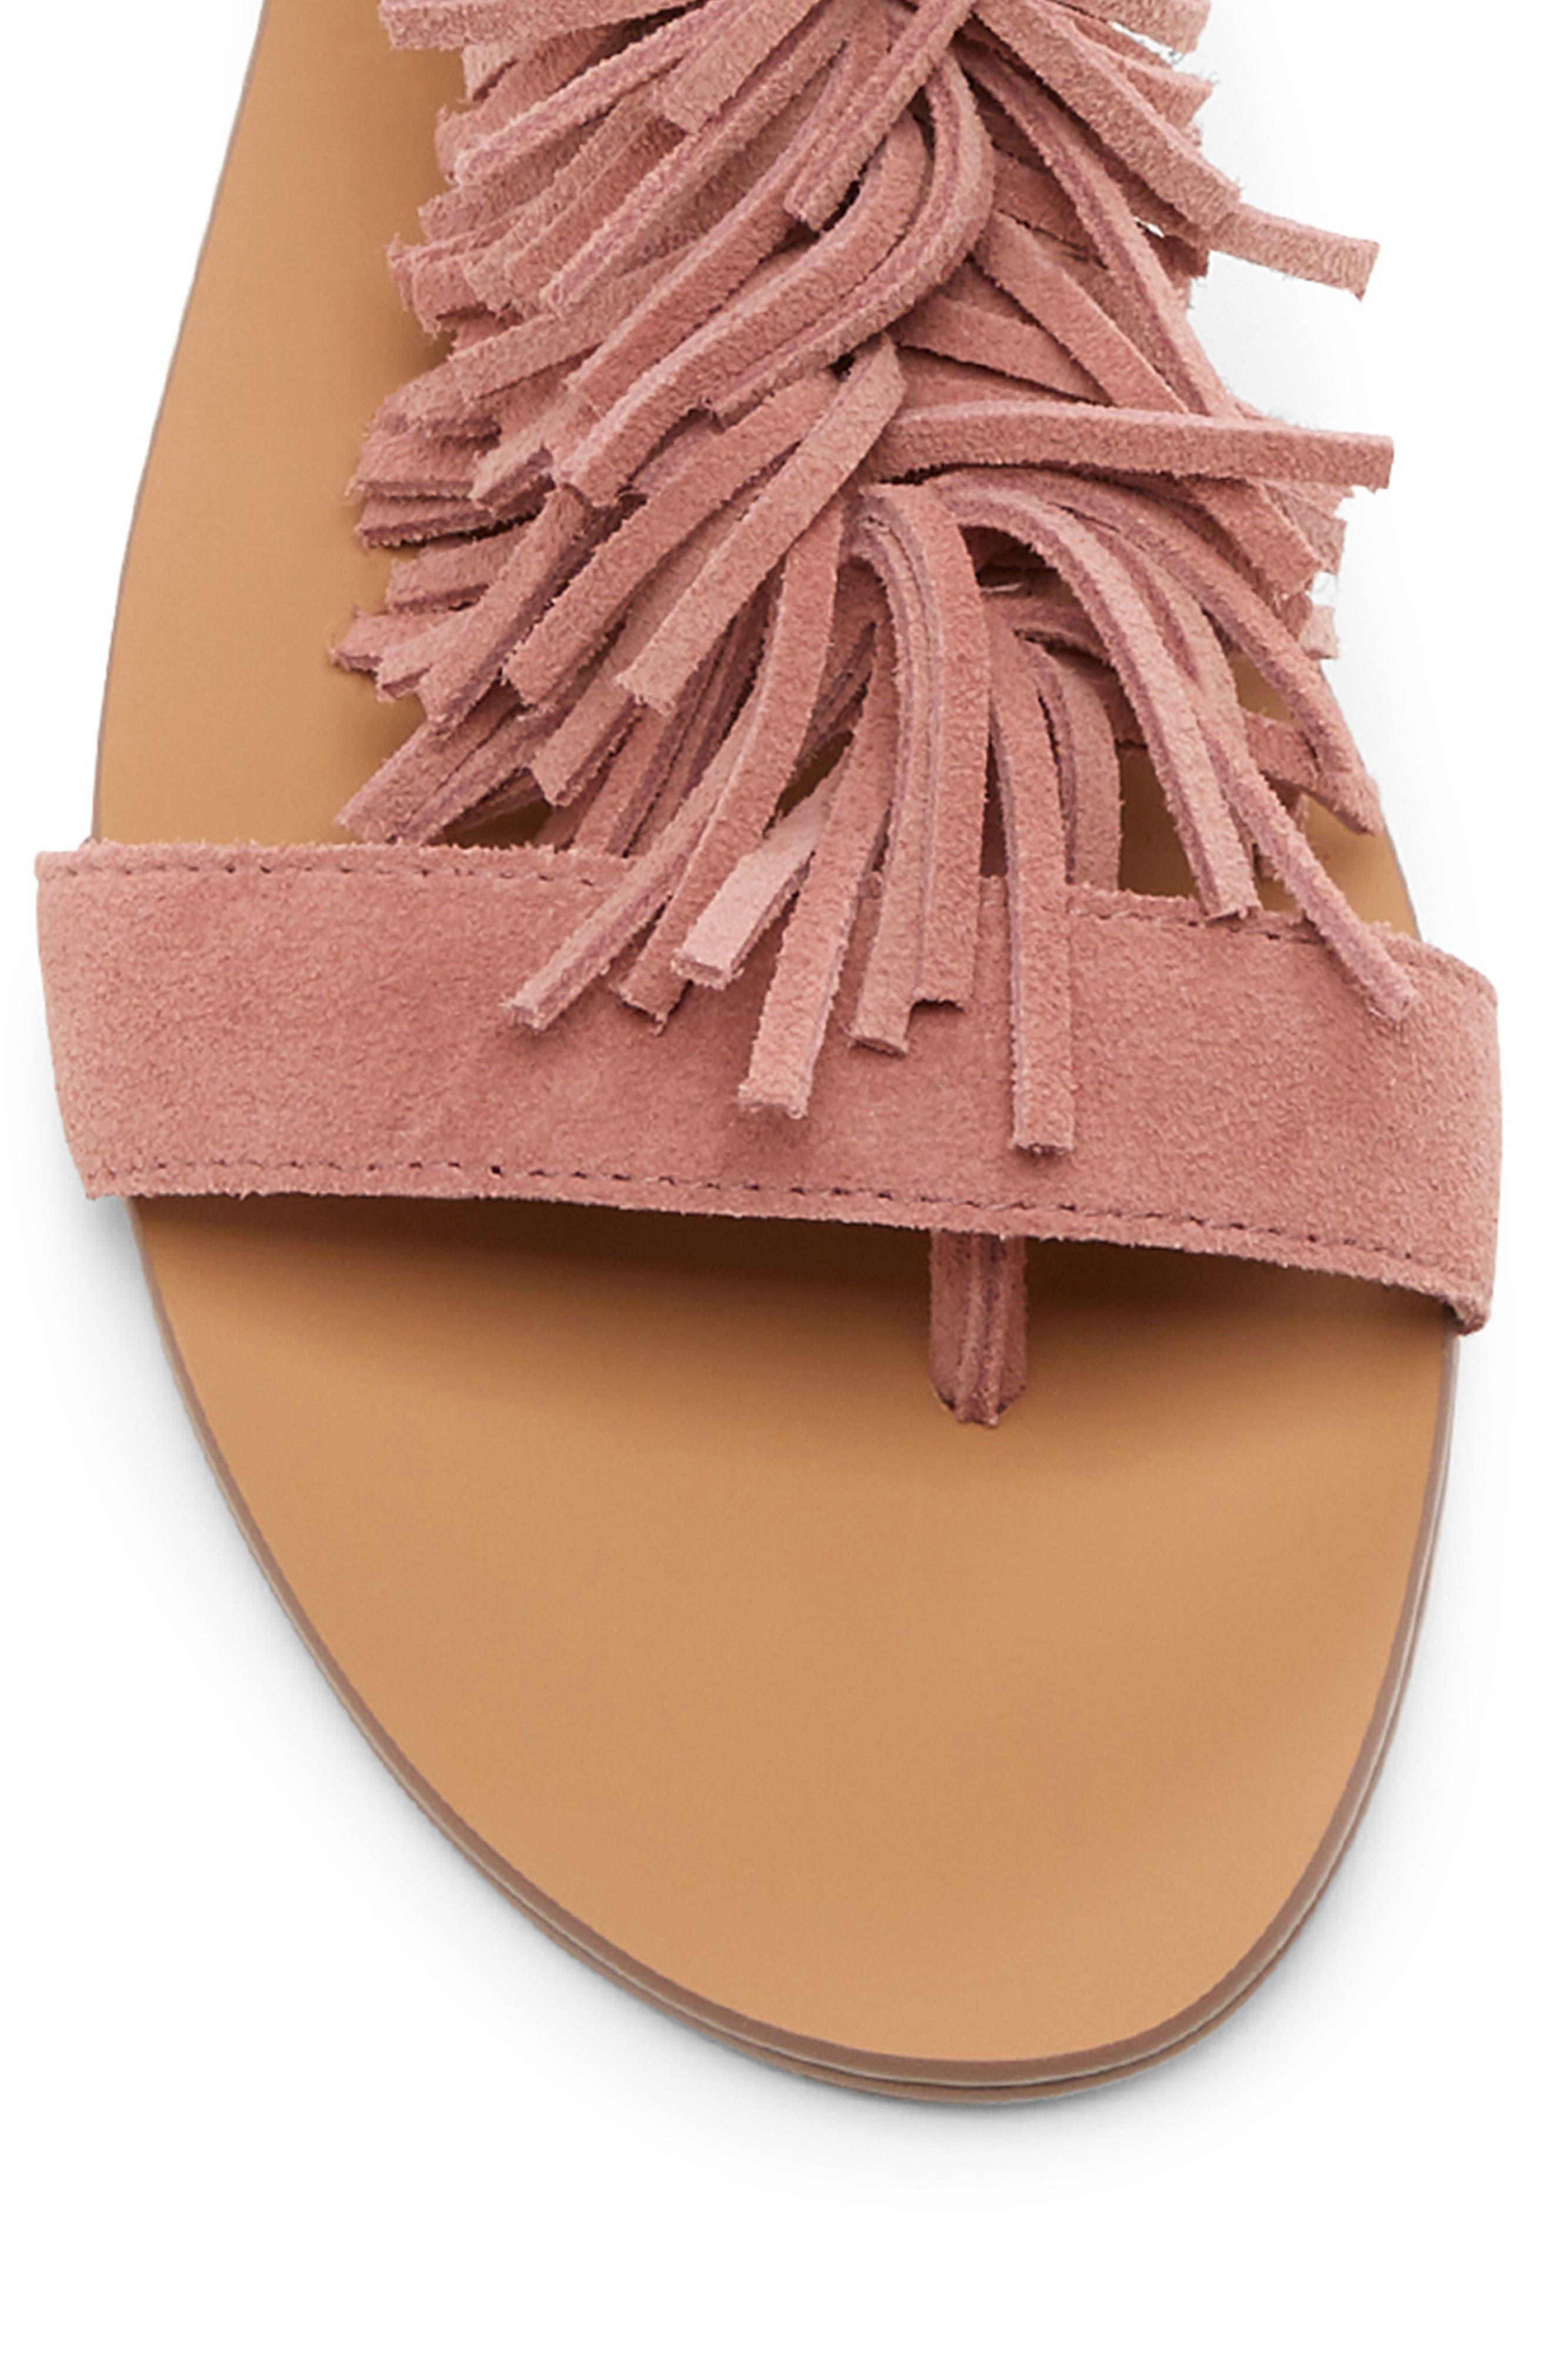 SOLE SOCIETY, 'Koa' Fringe T-Strap Flat Sandal, Alternate thumbnail 8, color, MOD MAUVE SUEDE